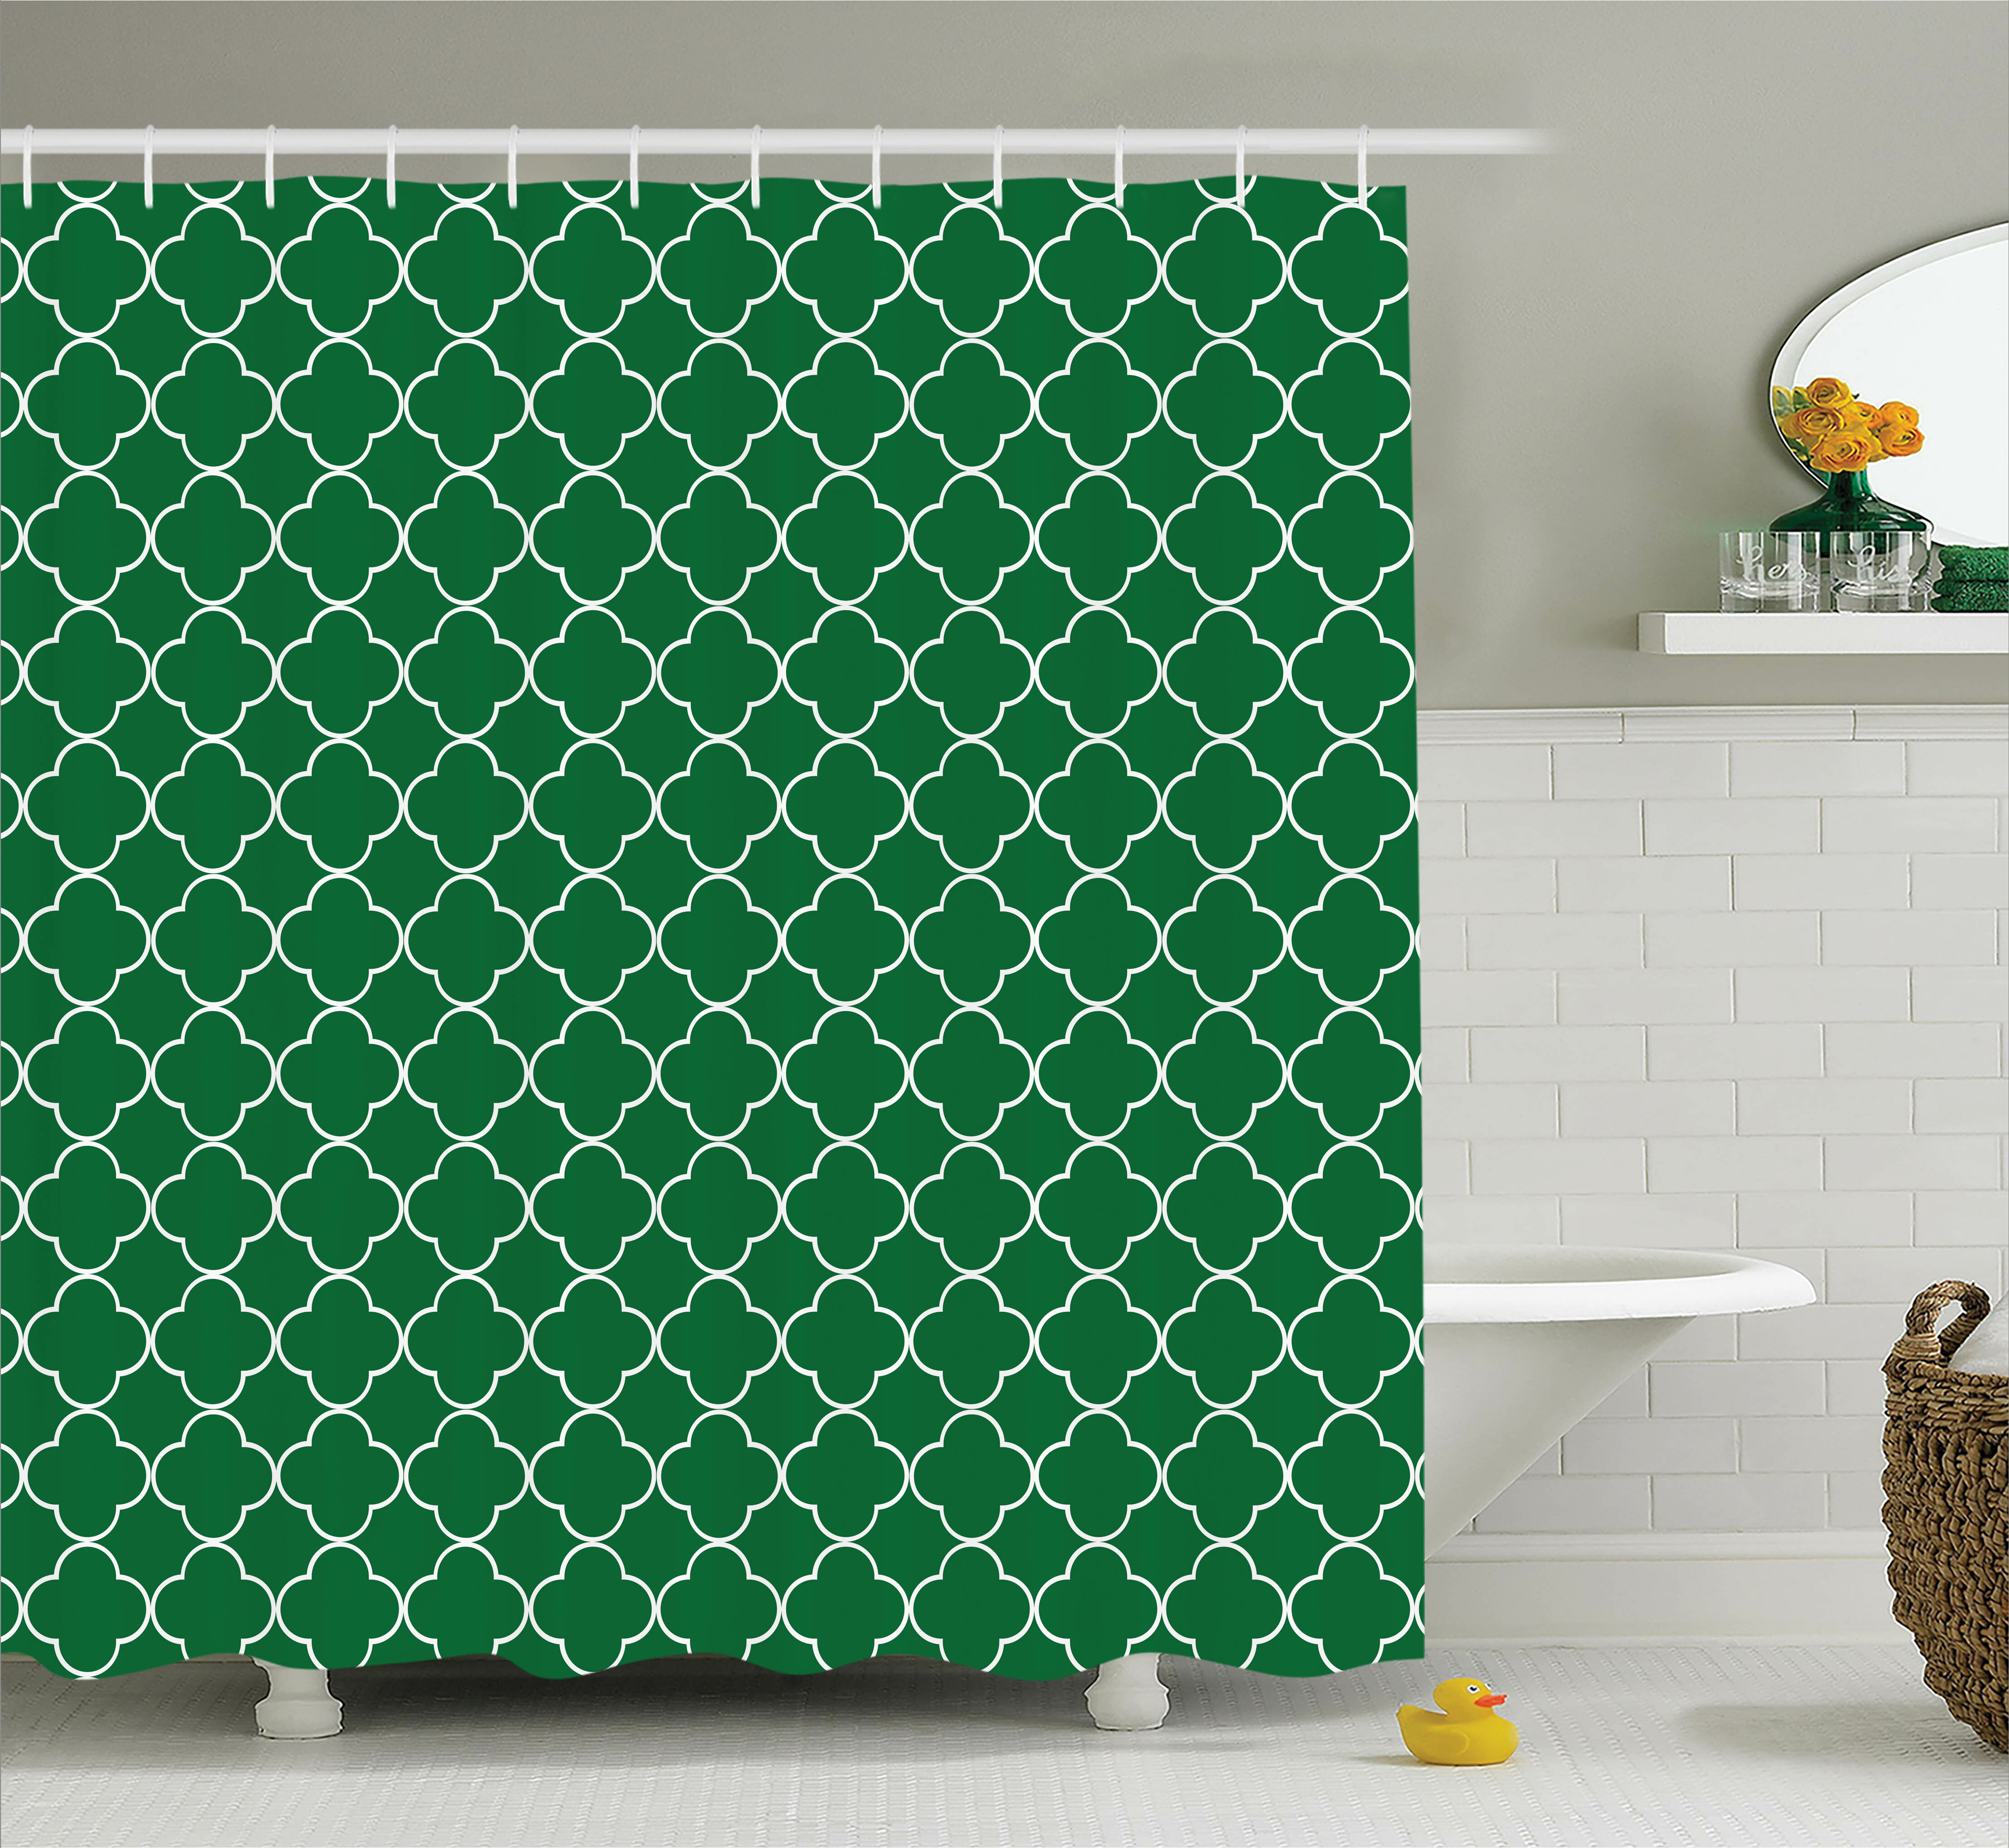 Red Barrel Studio Timberlane Quatrefoil Four Leaf Clover On Moroccan Trellis Mosaic Digital Print House Cafe Decor Single Shower Curtain Wayfair